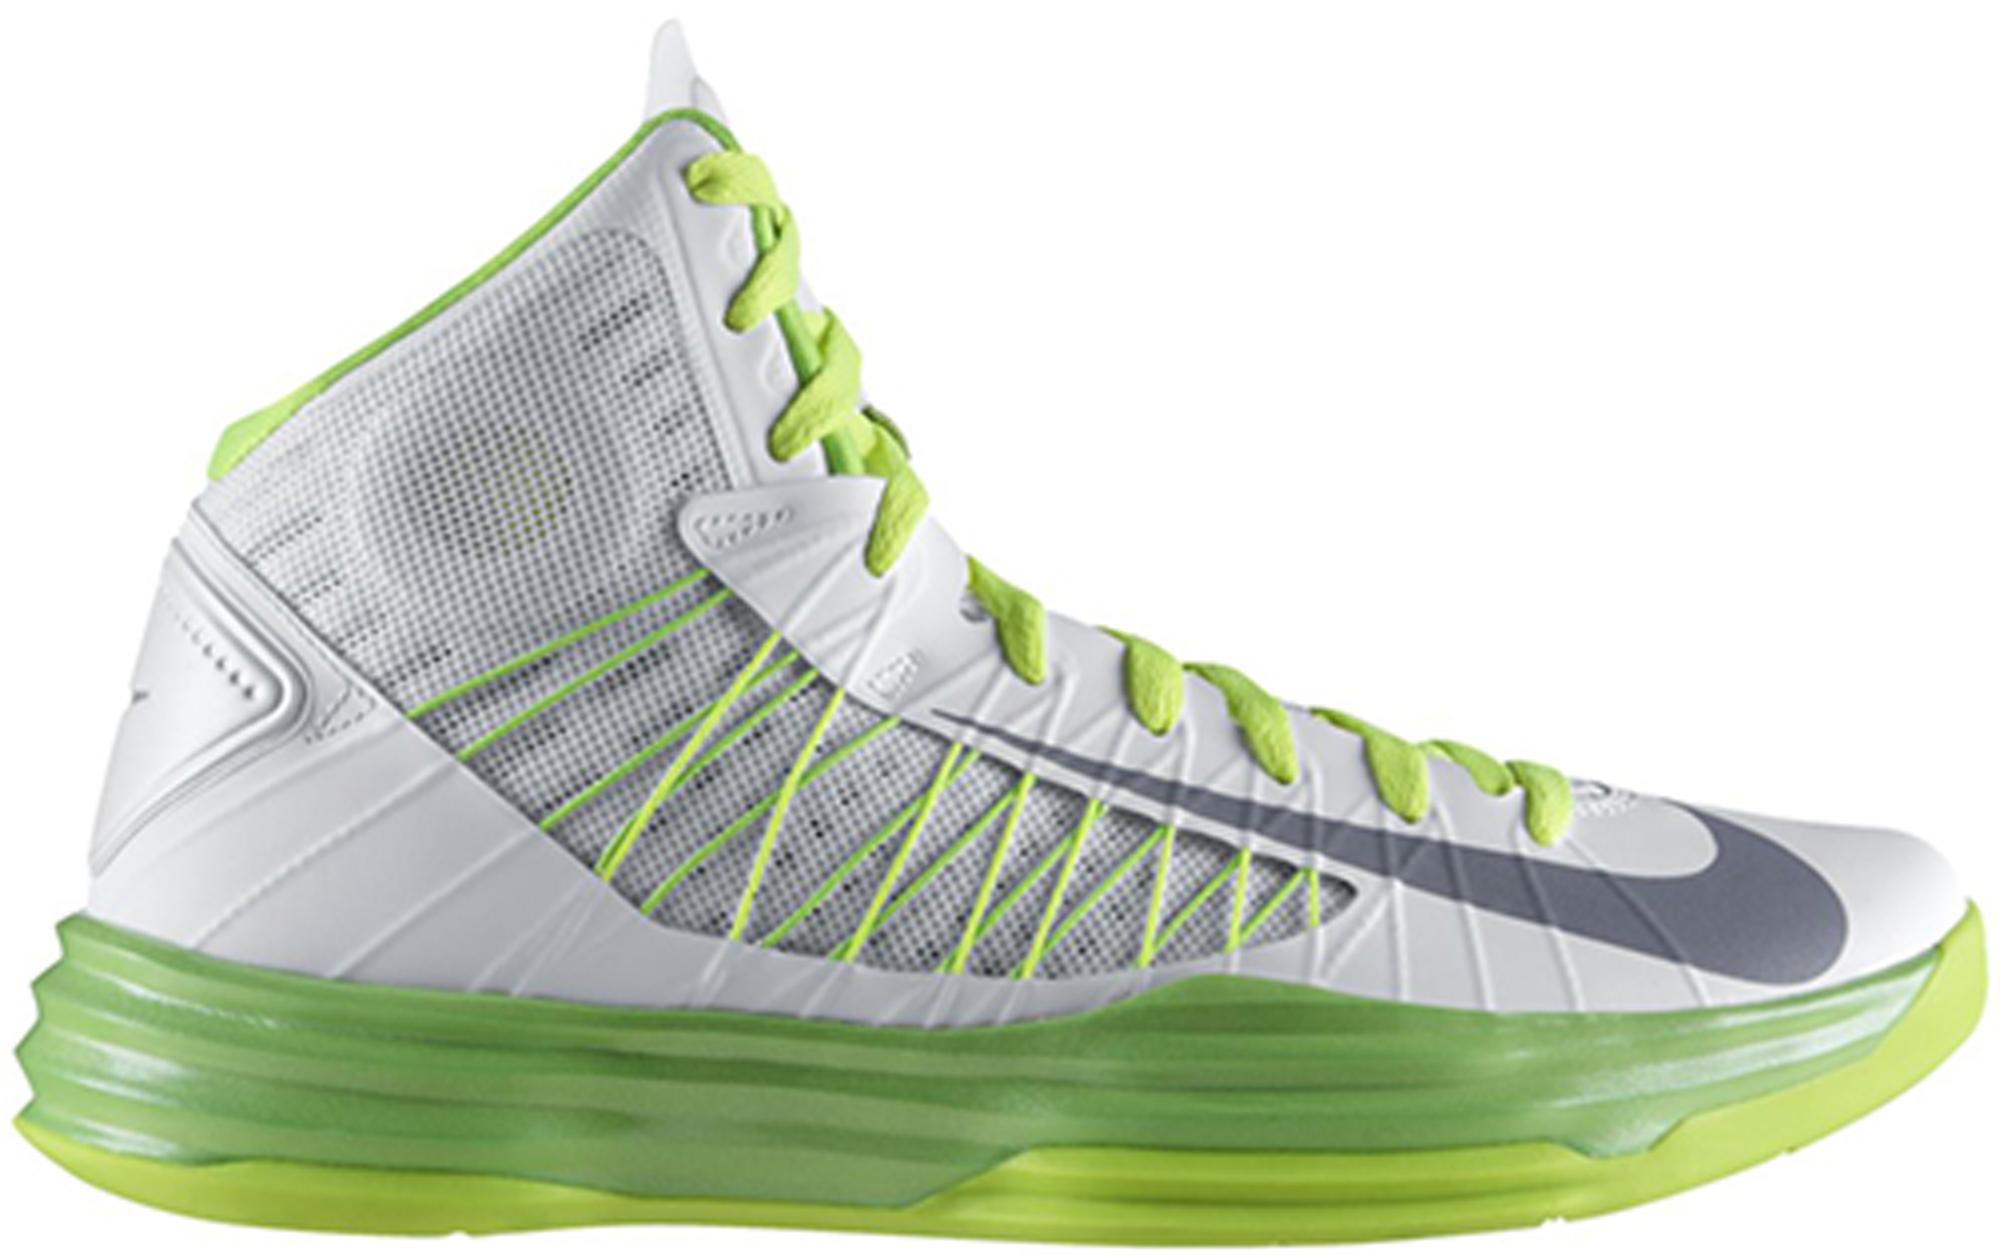 Nike Lunar Hyperdunk 2012 White